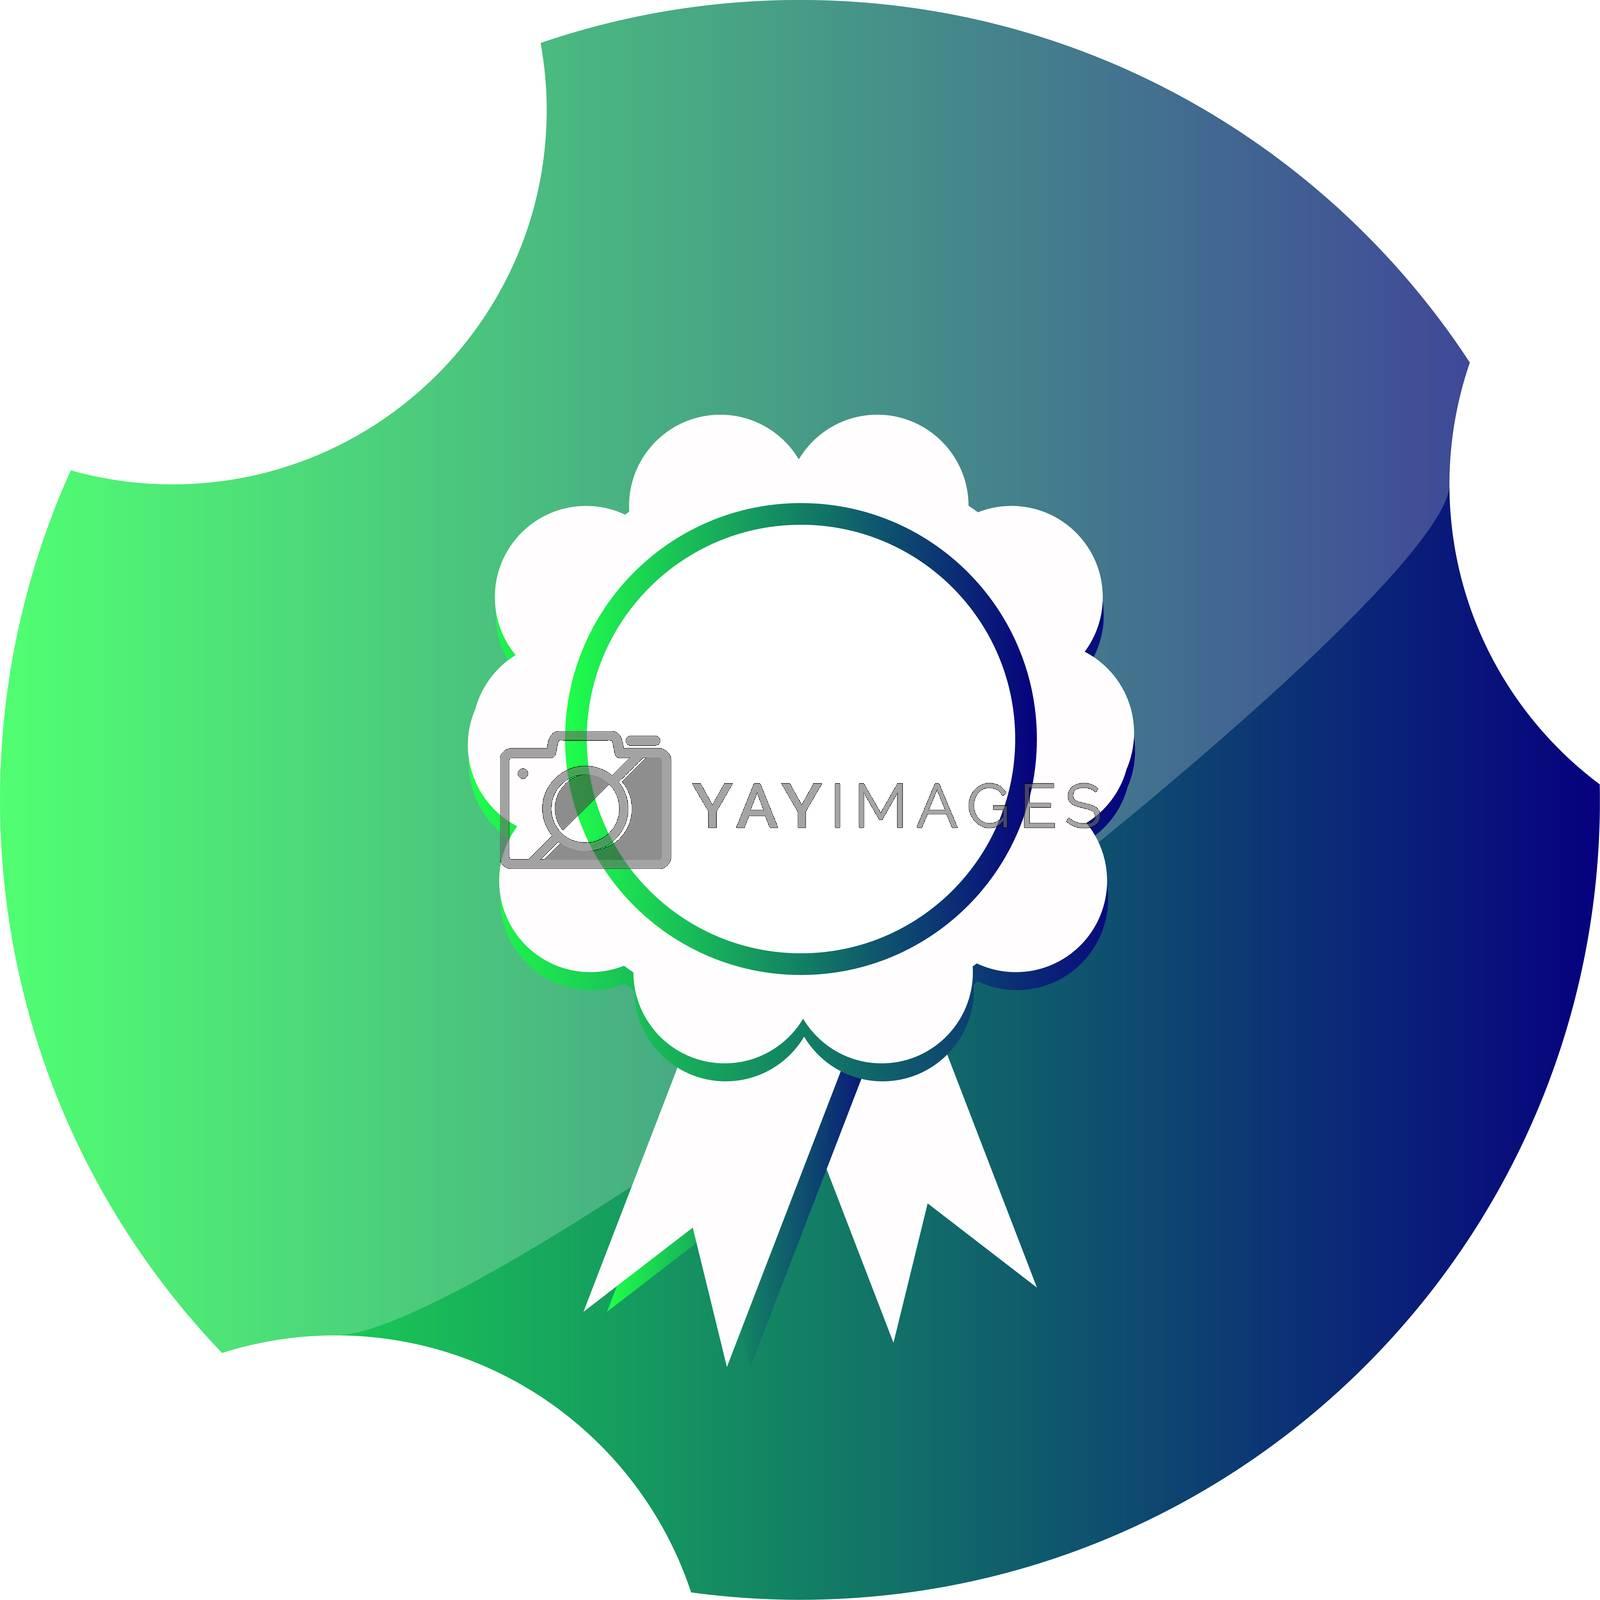 Pictograph of award. Web icon pictograph of award